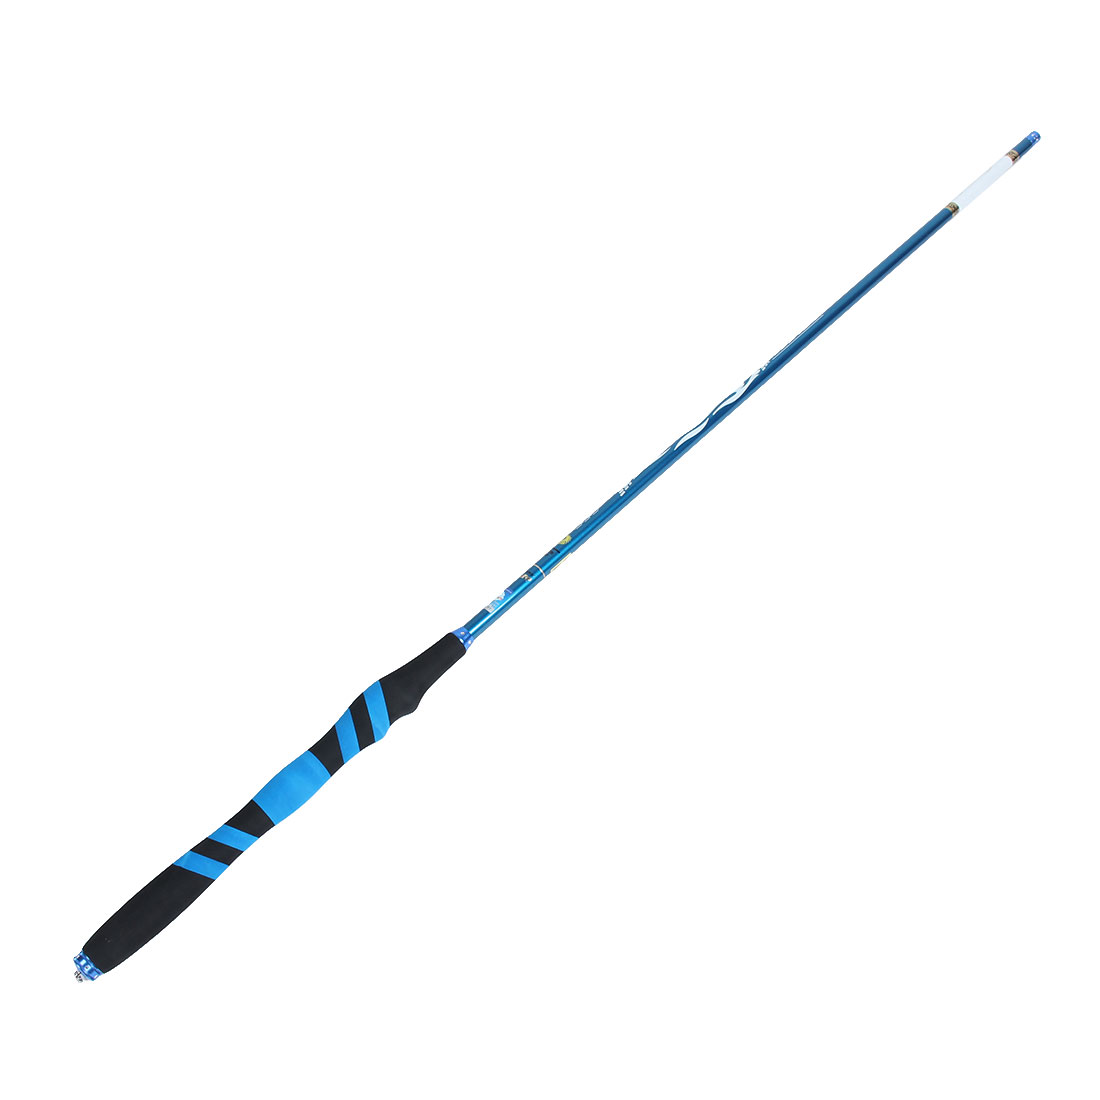 Travel Hiking Carbon Fiber Telescopic Portable Lightweight Fishing Spinning Rod Pole 5.4M Length